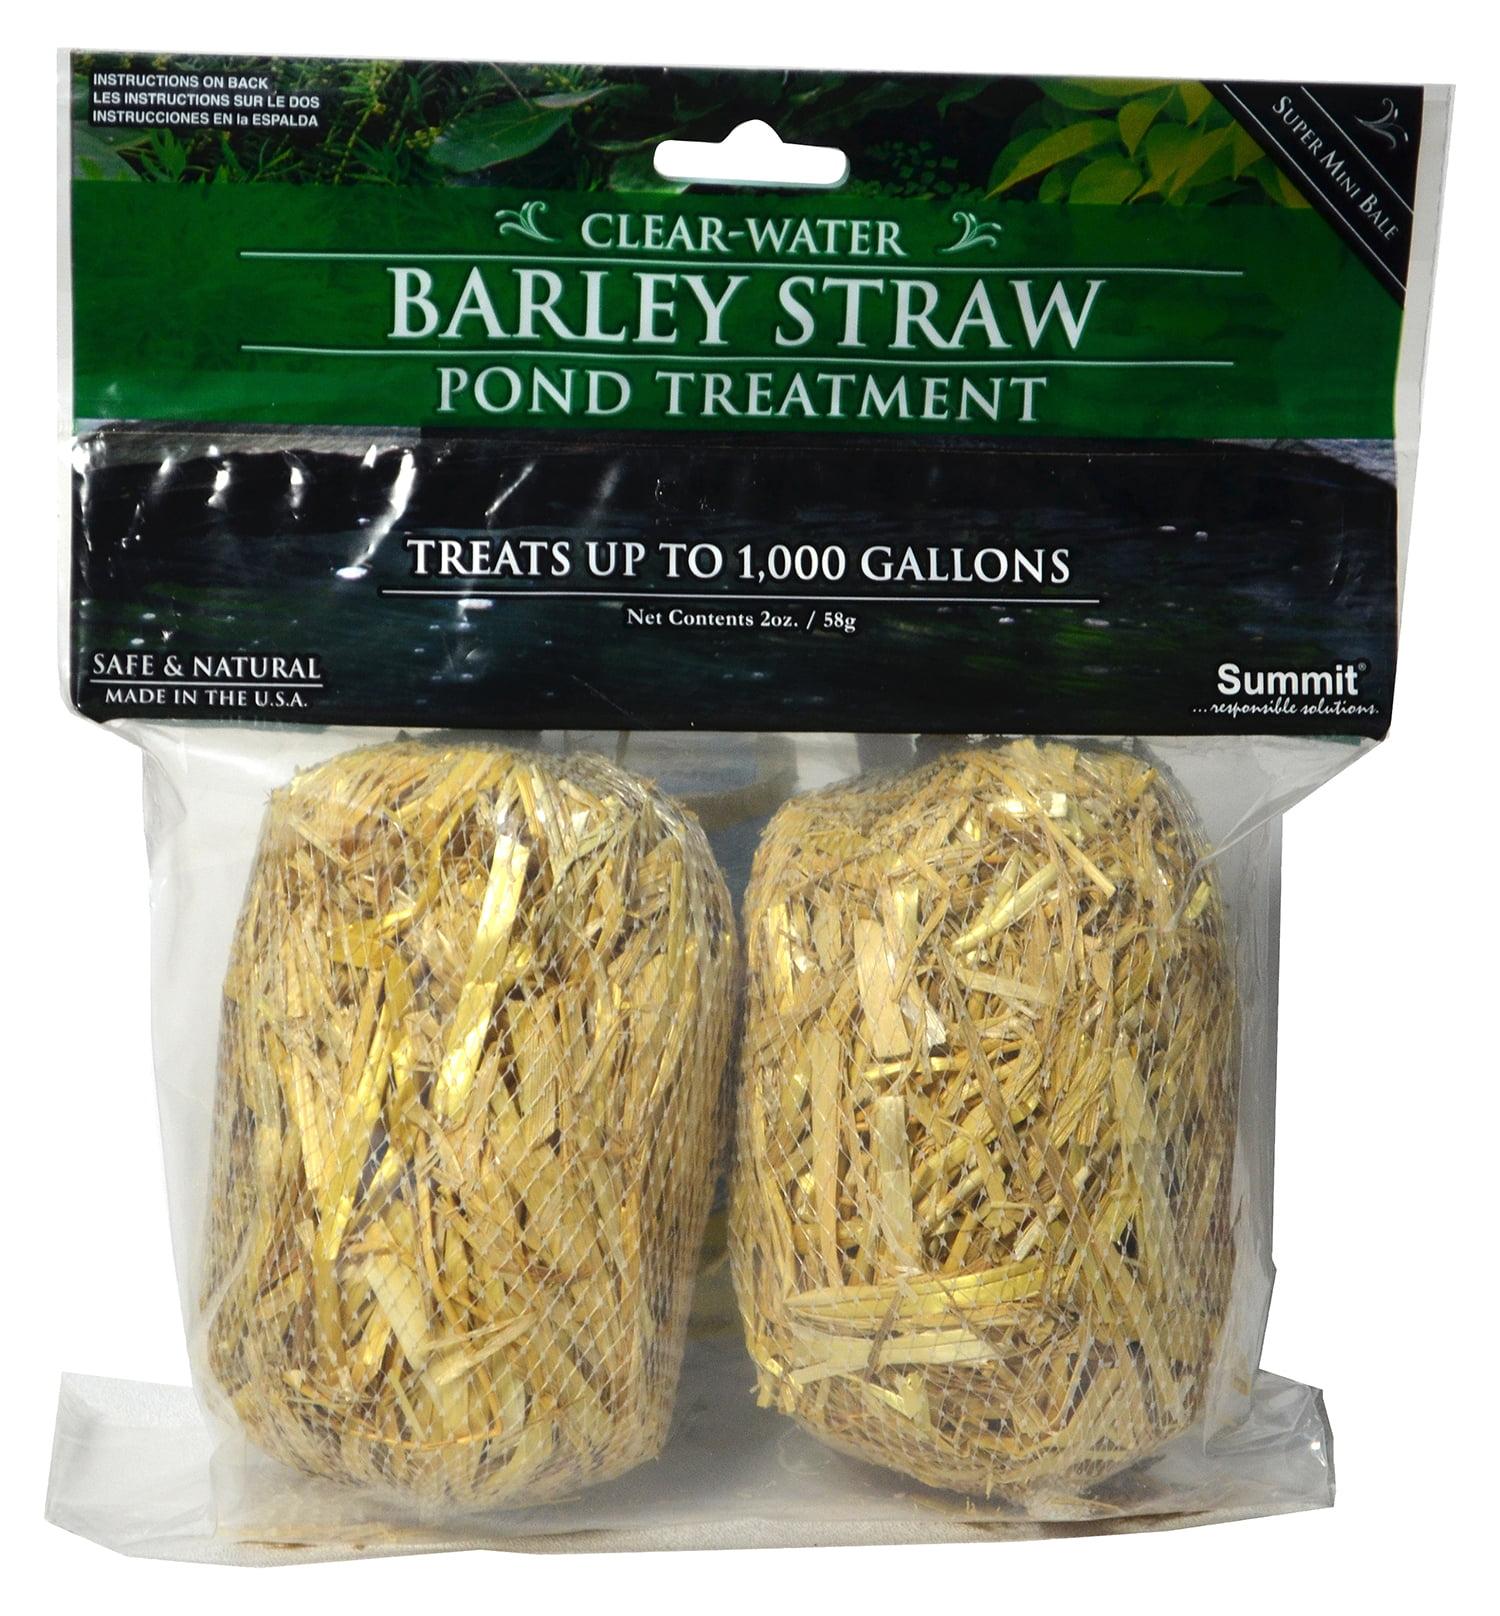 Summit Chemical #125 1000 Gallon Clear Water Barley Straw